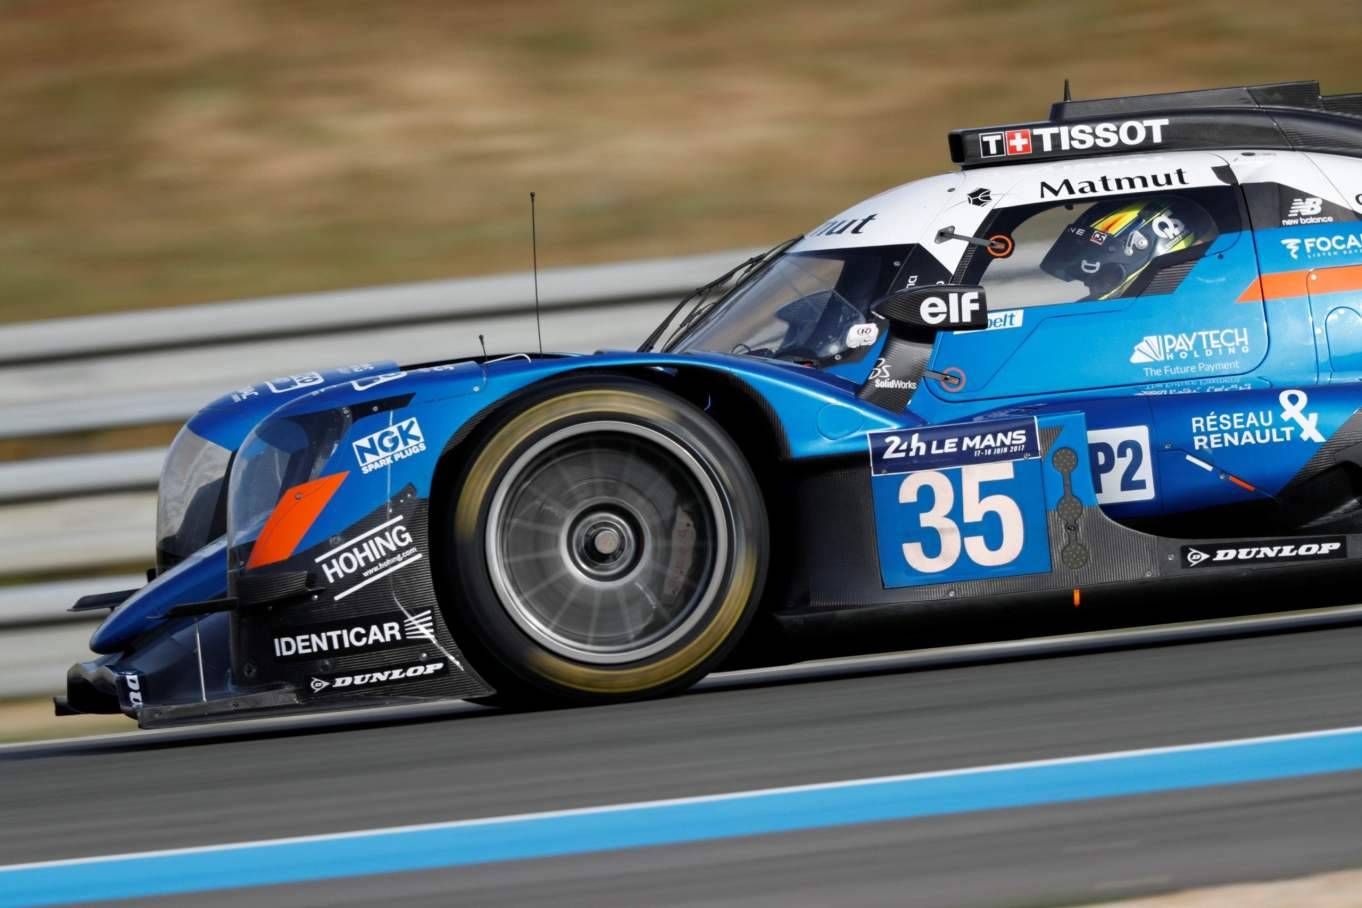 Alpine A470 24 Heures du Mans 2017 Signatech Matmut Endurance WEC Panciatici Ragues Menezes Rao Negrao Dumas (12)